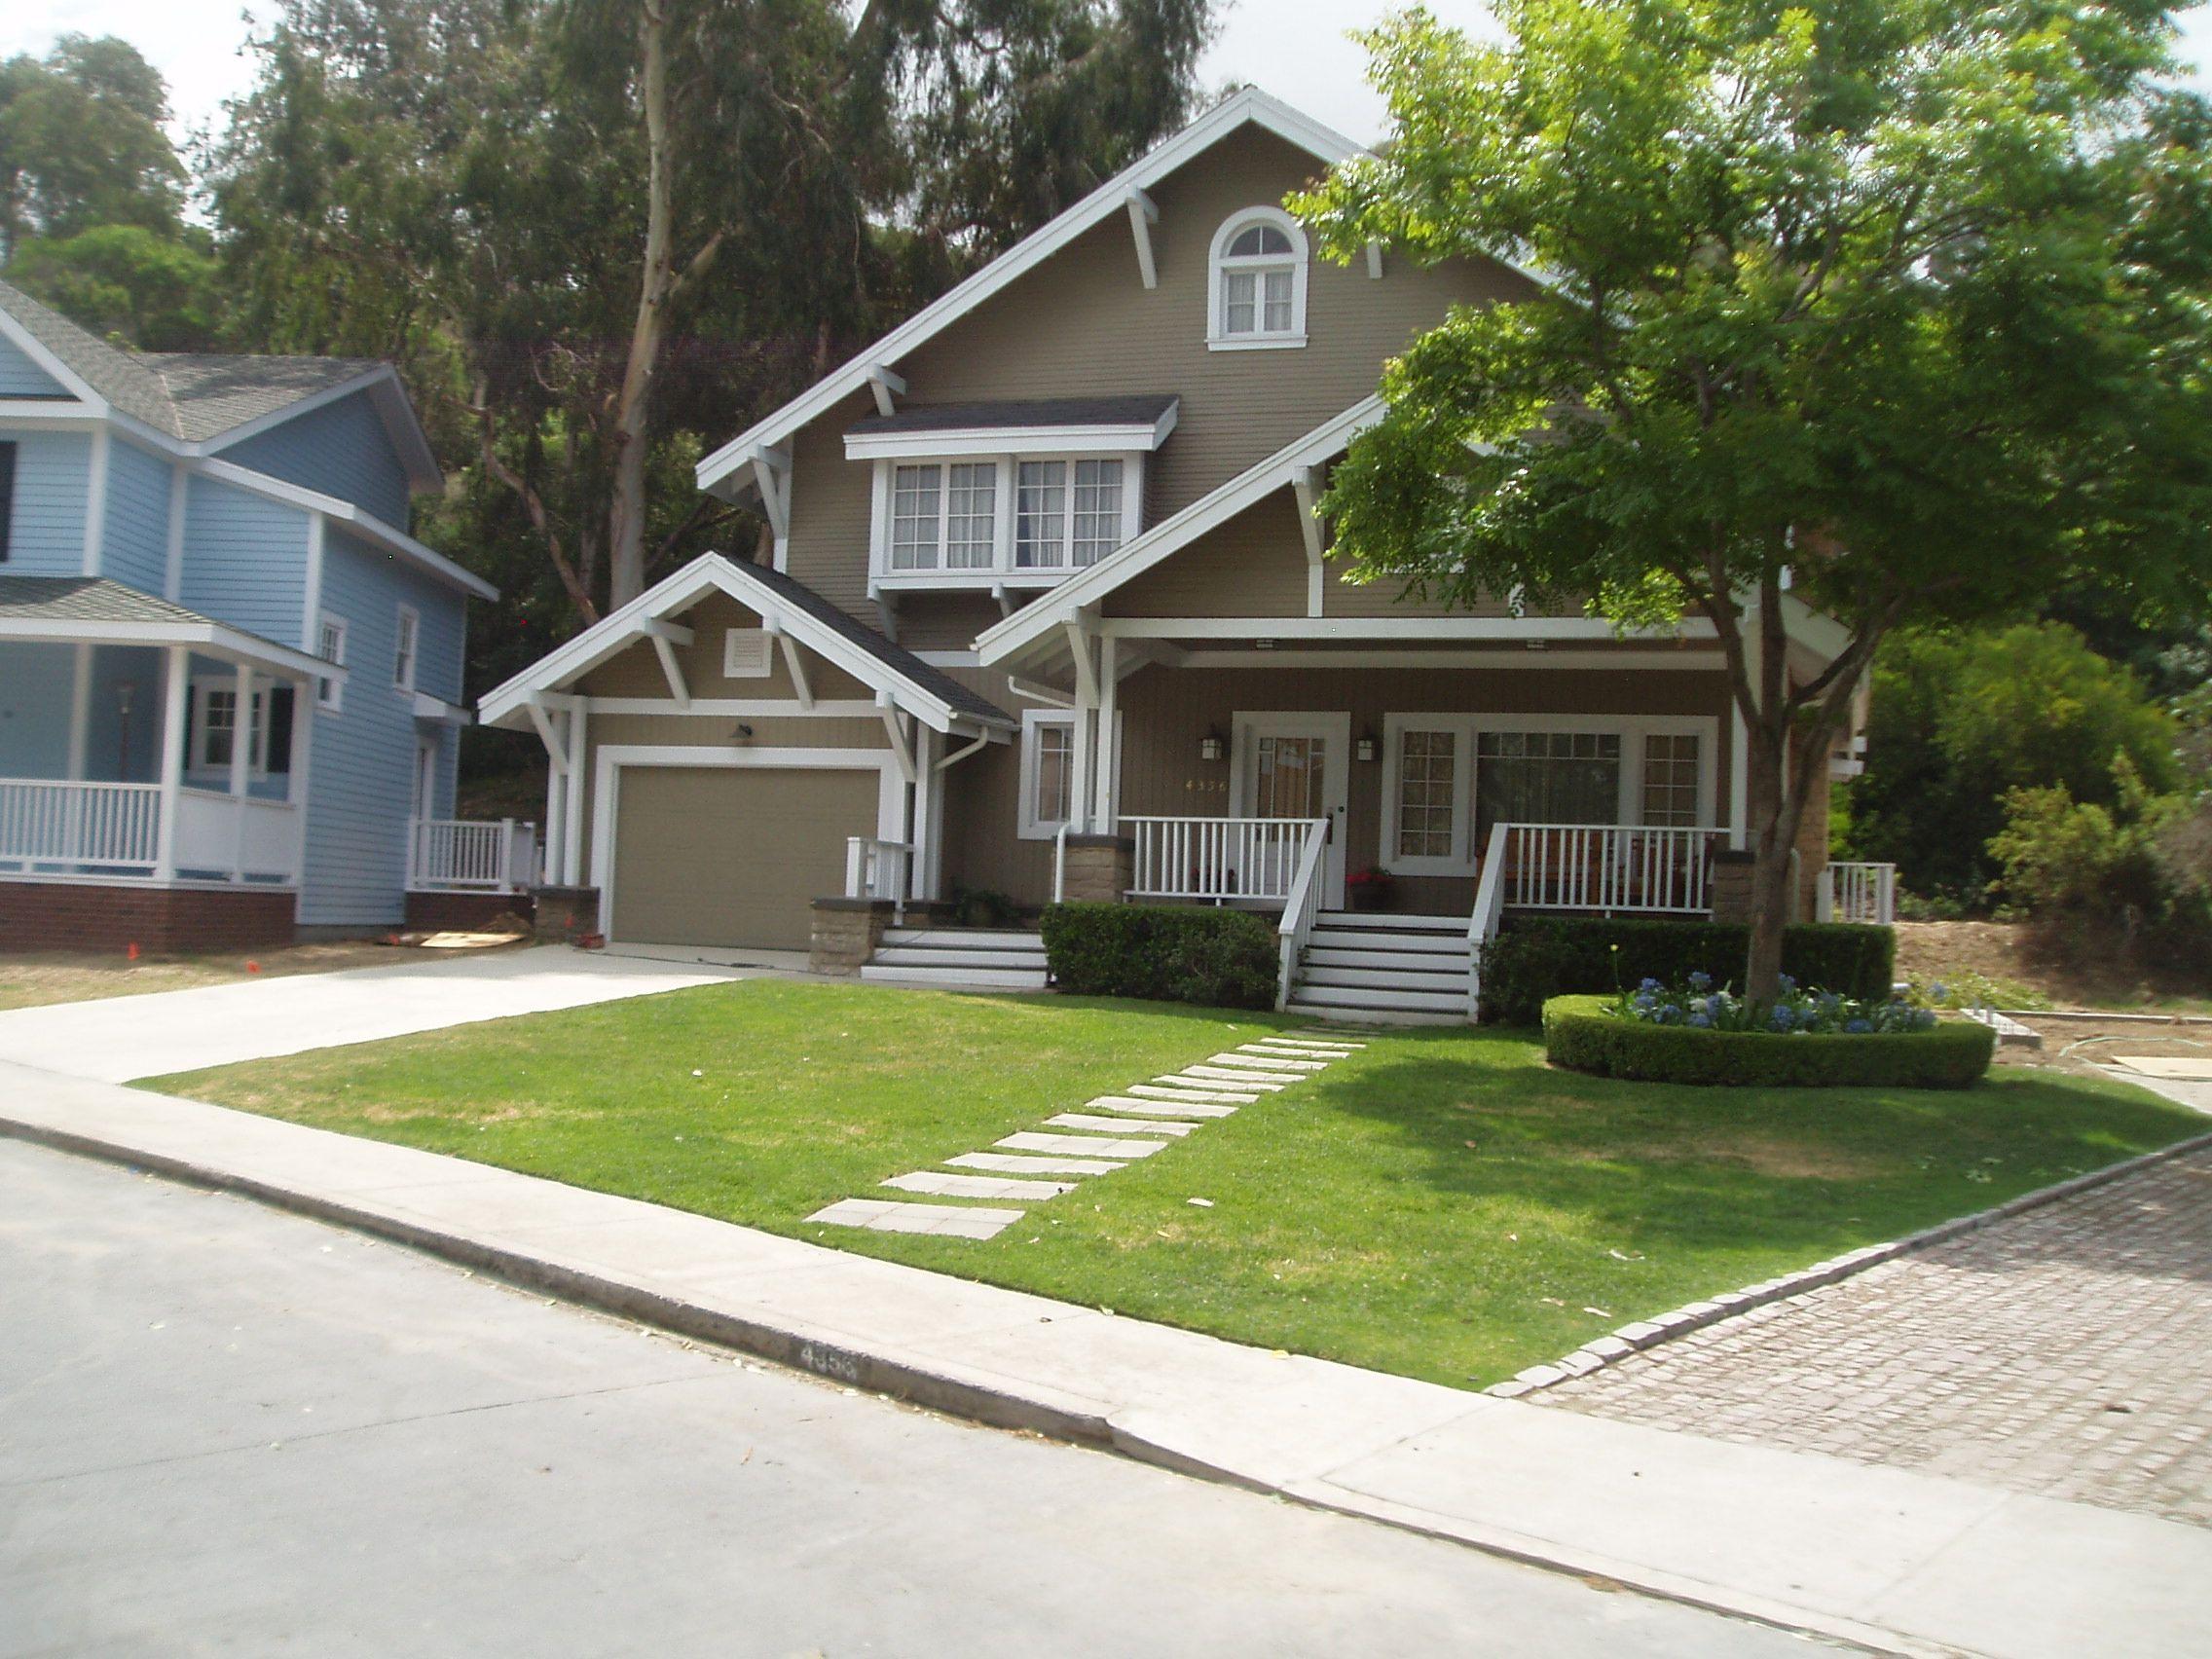 The DelfinoMayfair Home at 4356 Wisteria Lane